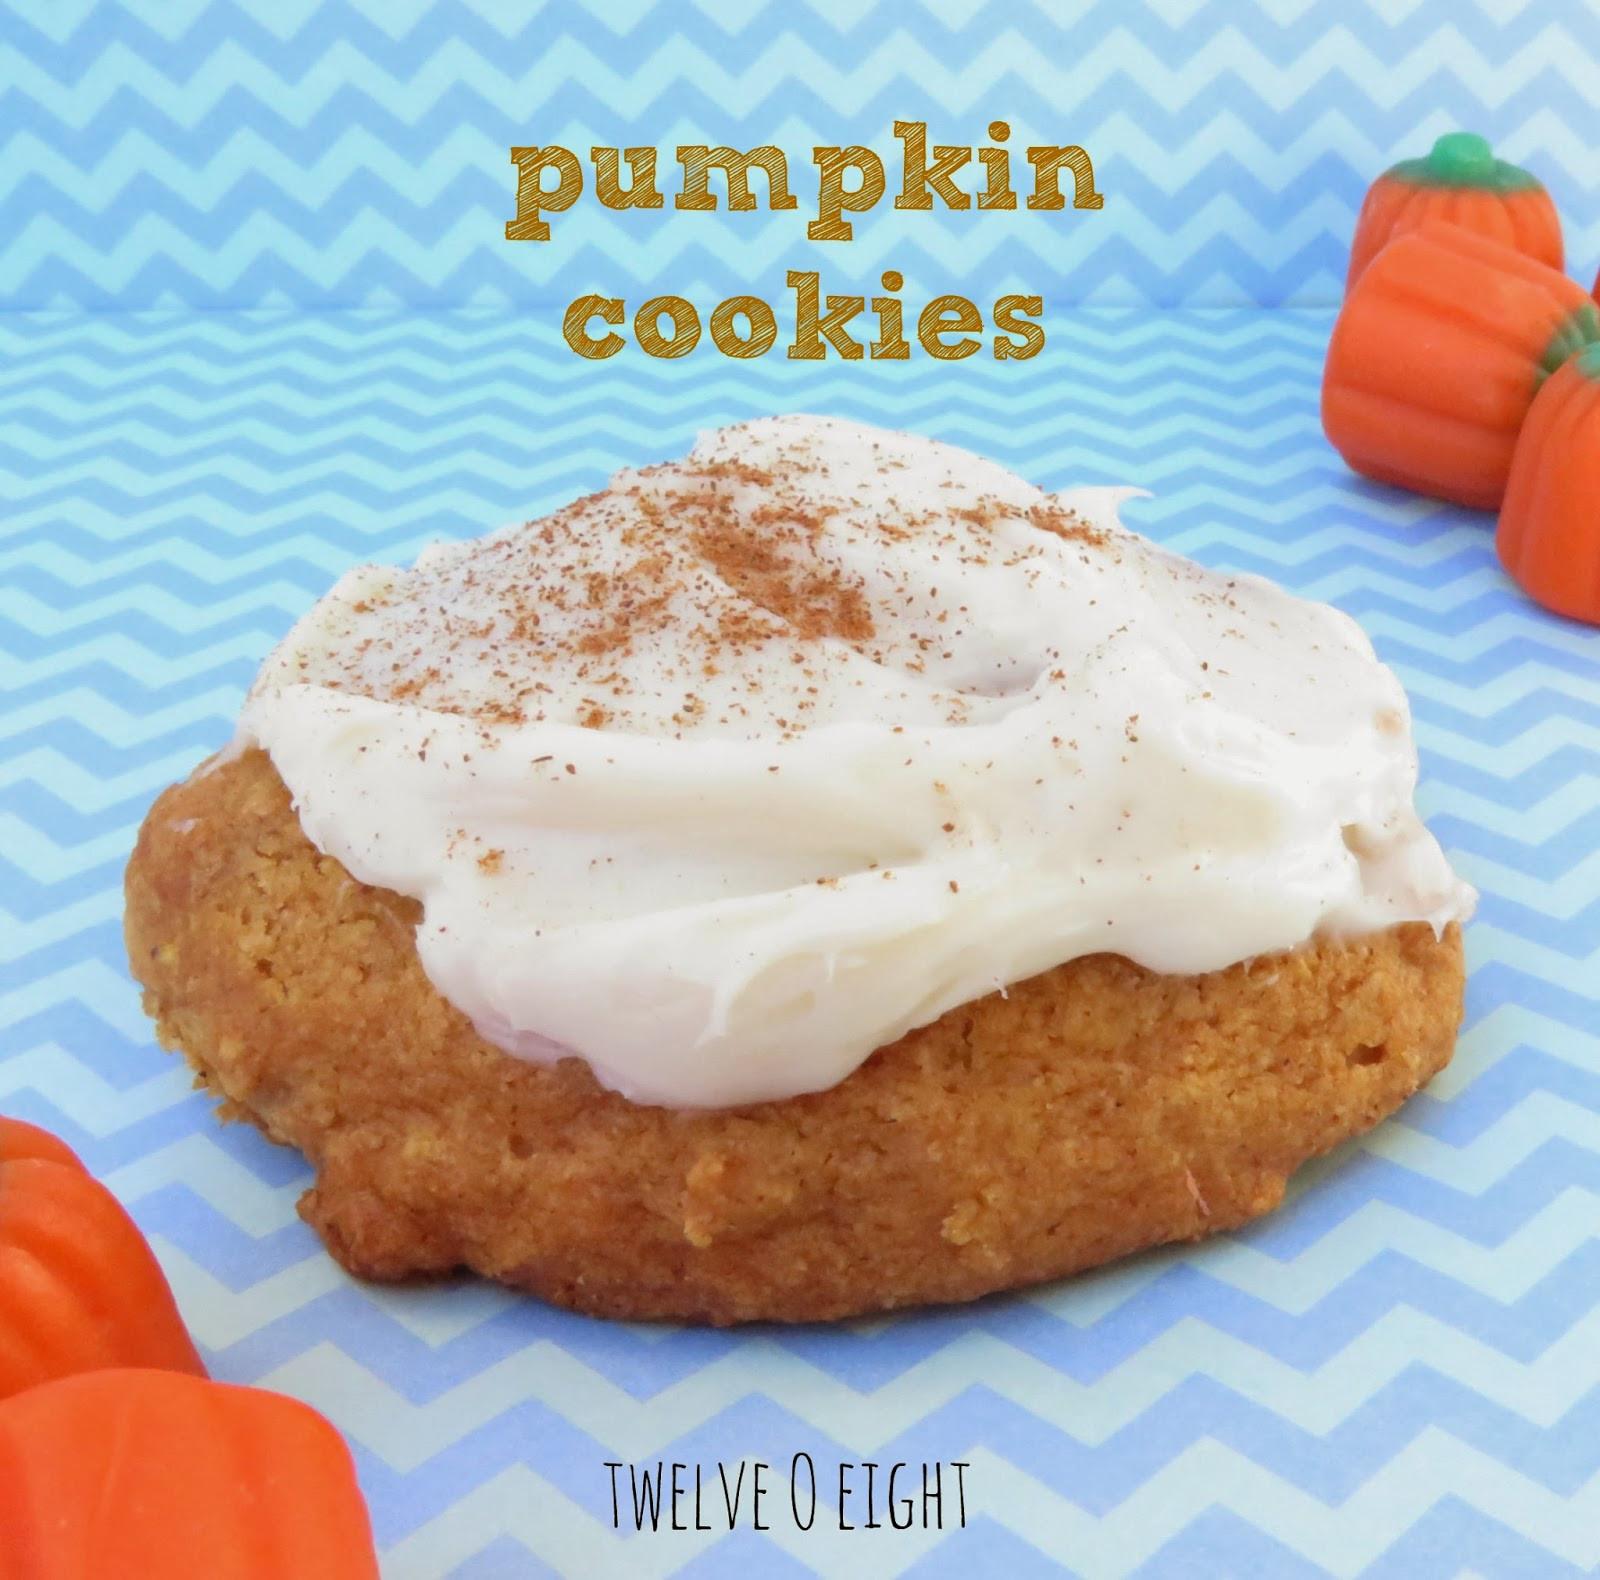 Pumpkin Cookies Recipe  Pumpkin Cookie Recipe with Cream Cheese Frosting